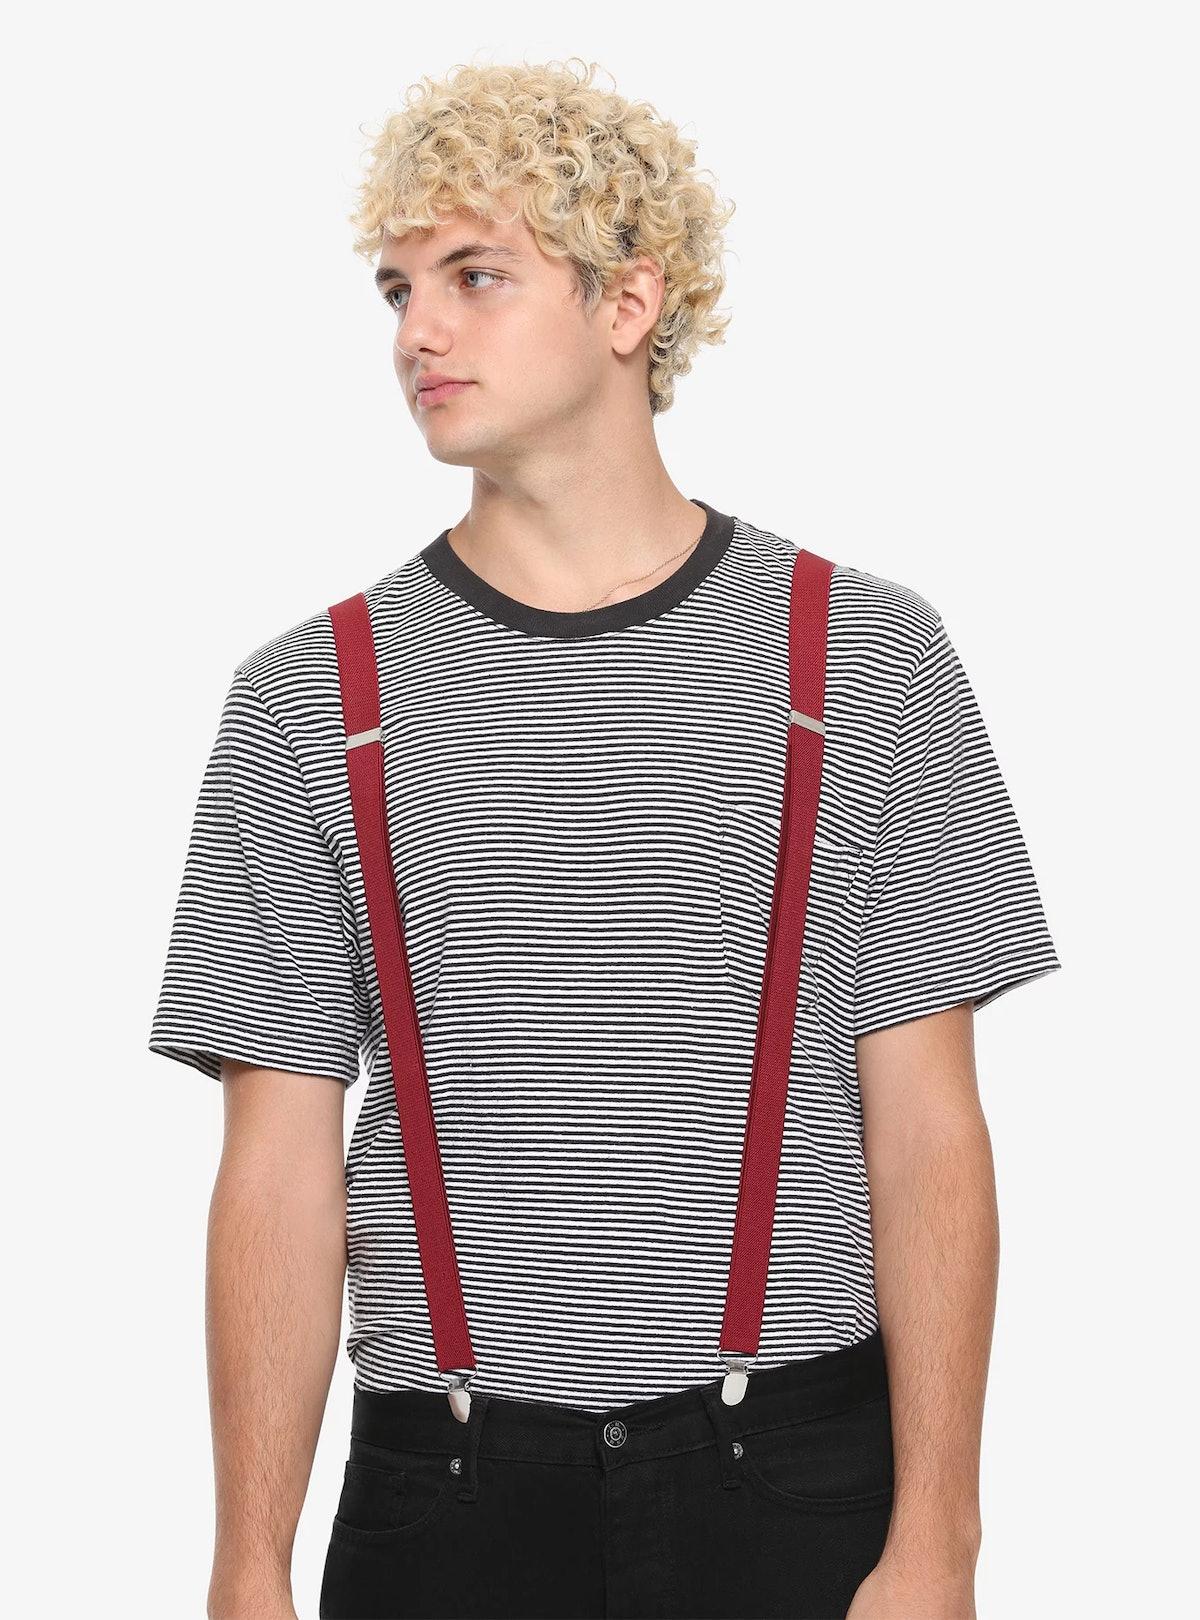 Hot Topic Burgundy Suspenders